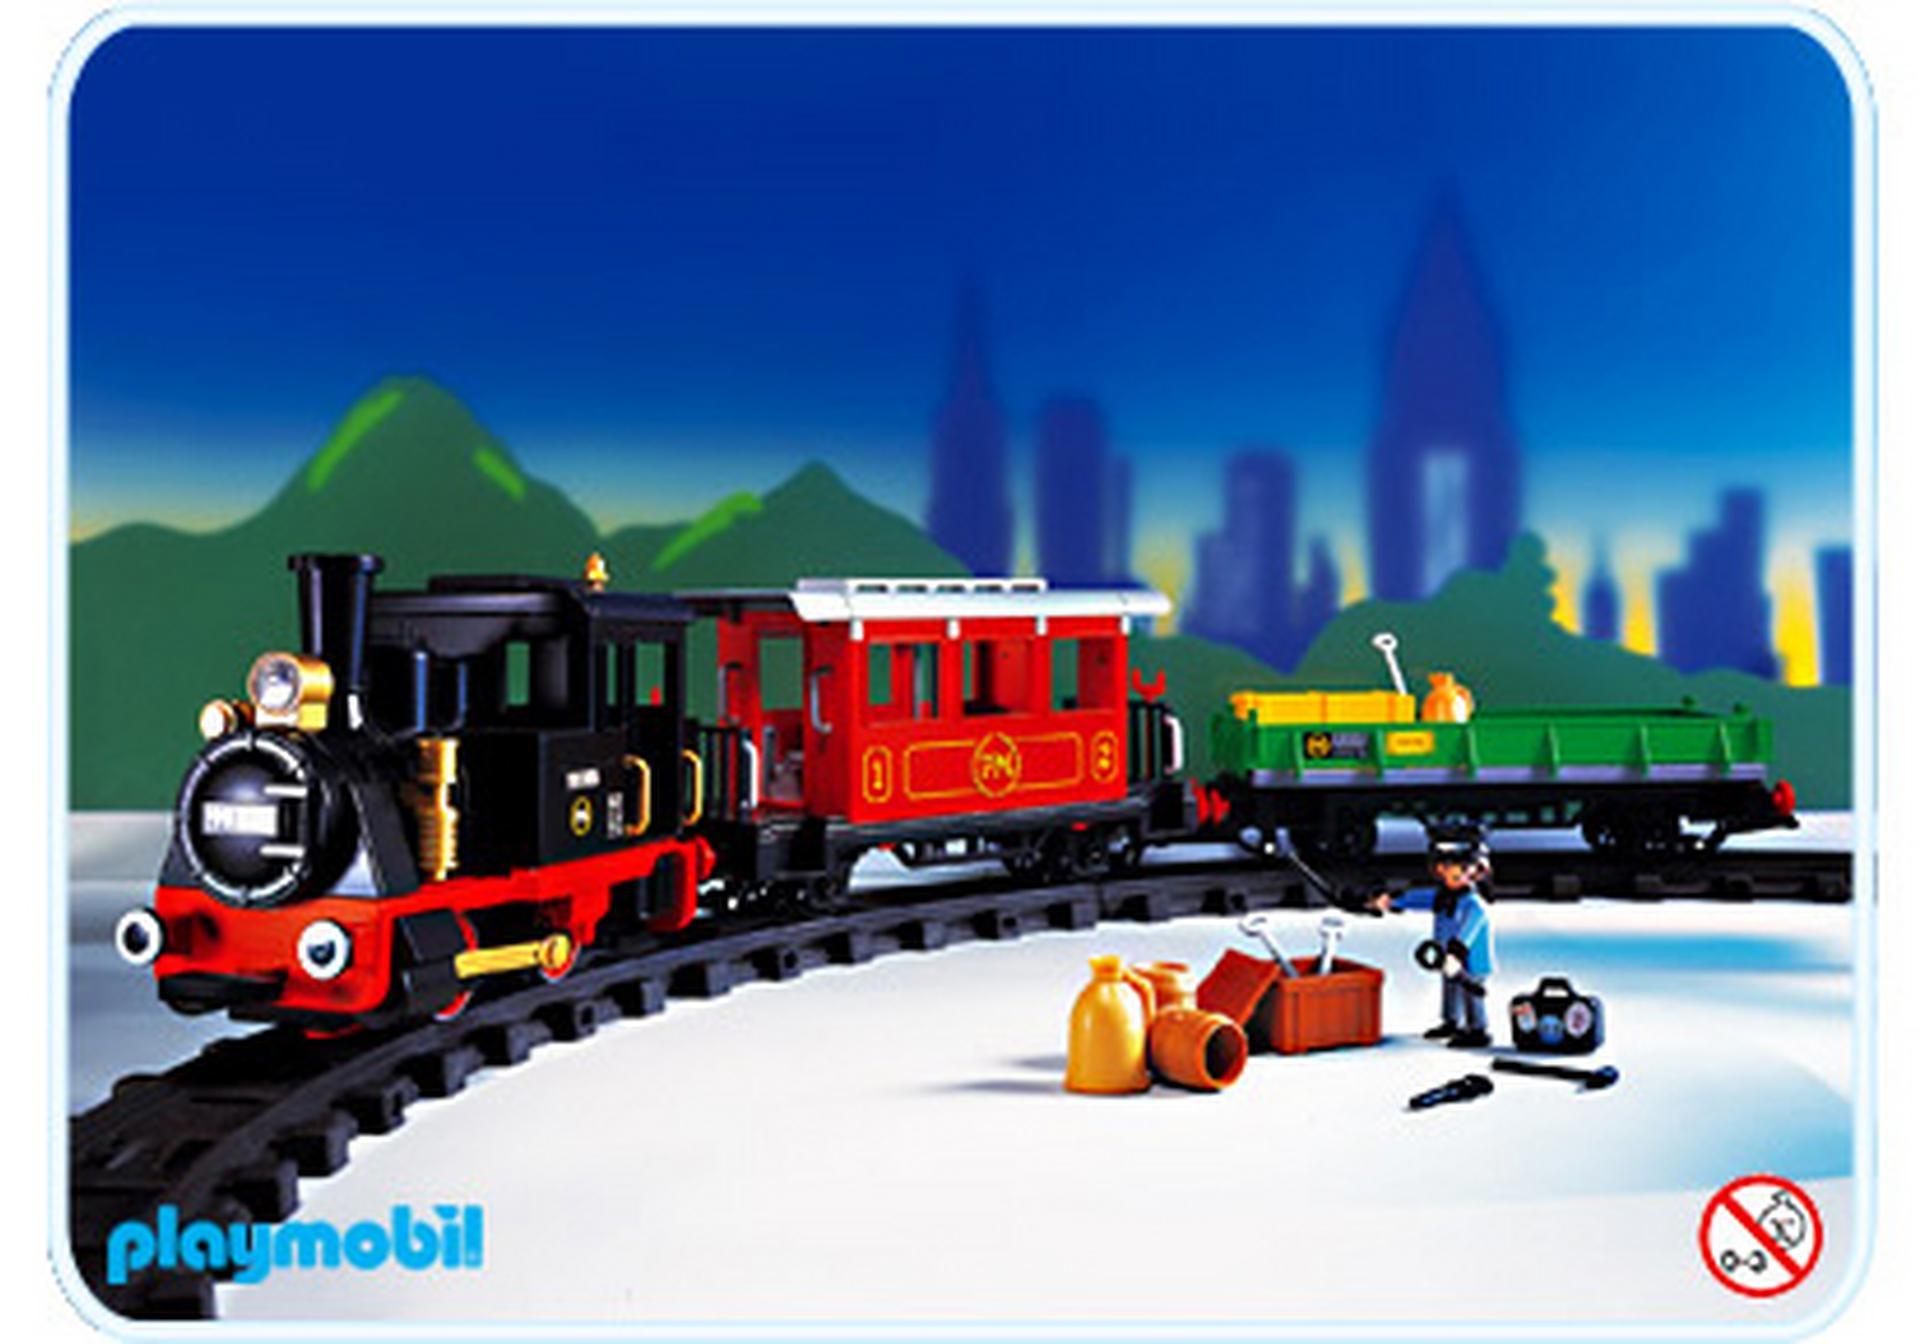 Train vapeur radiocommand 4017 a playmobil france - Train playmobil ...